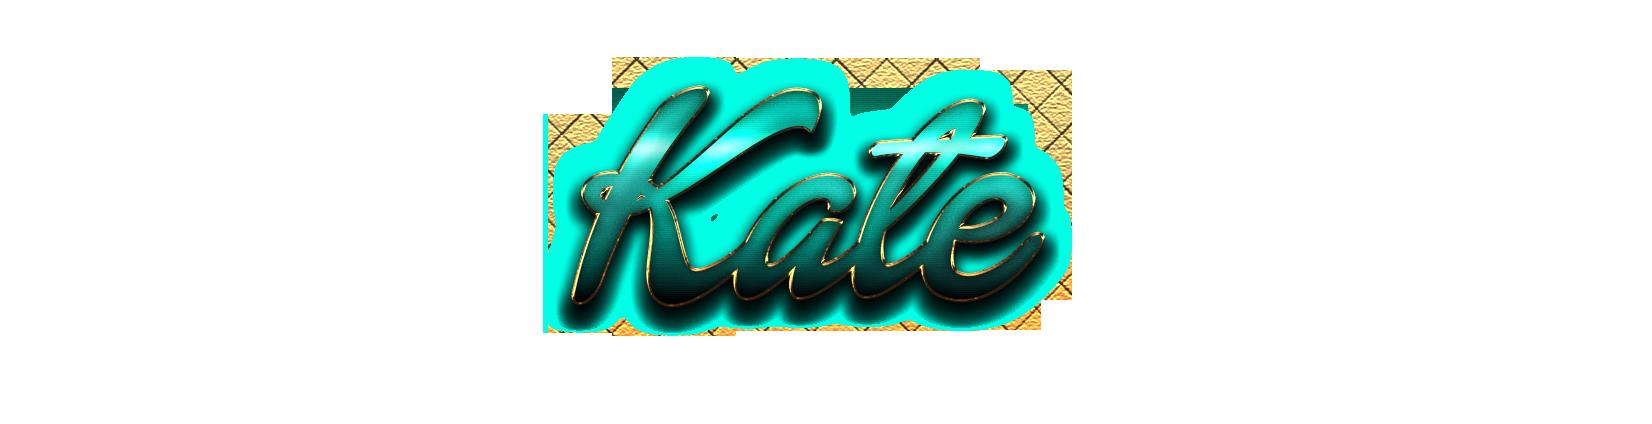 Kate PNG Transparent Images Free Download.